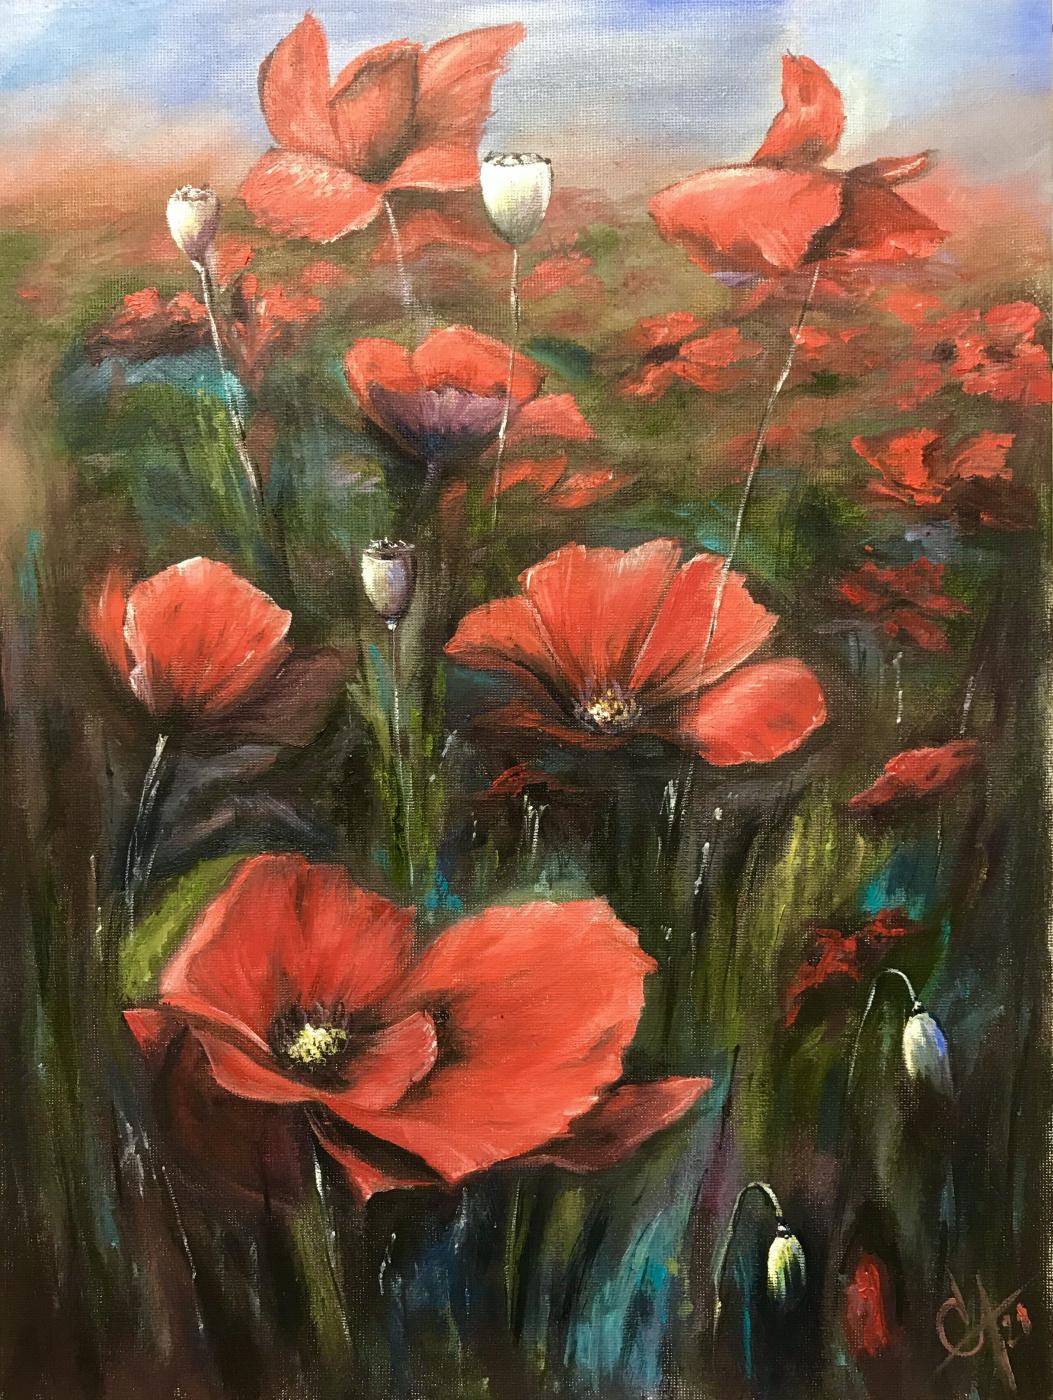 Svetlana Arkhipova. Crimson poppies in the grass